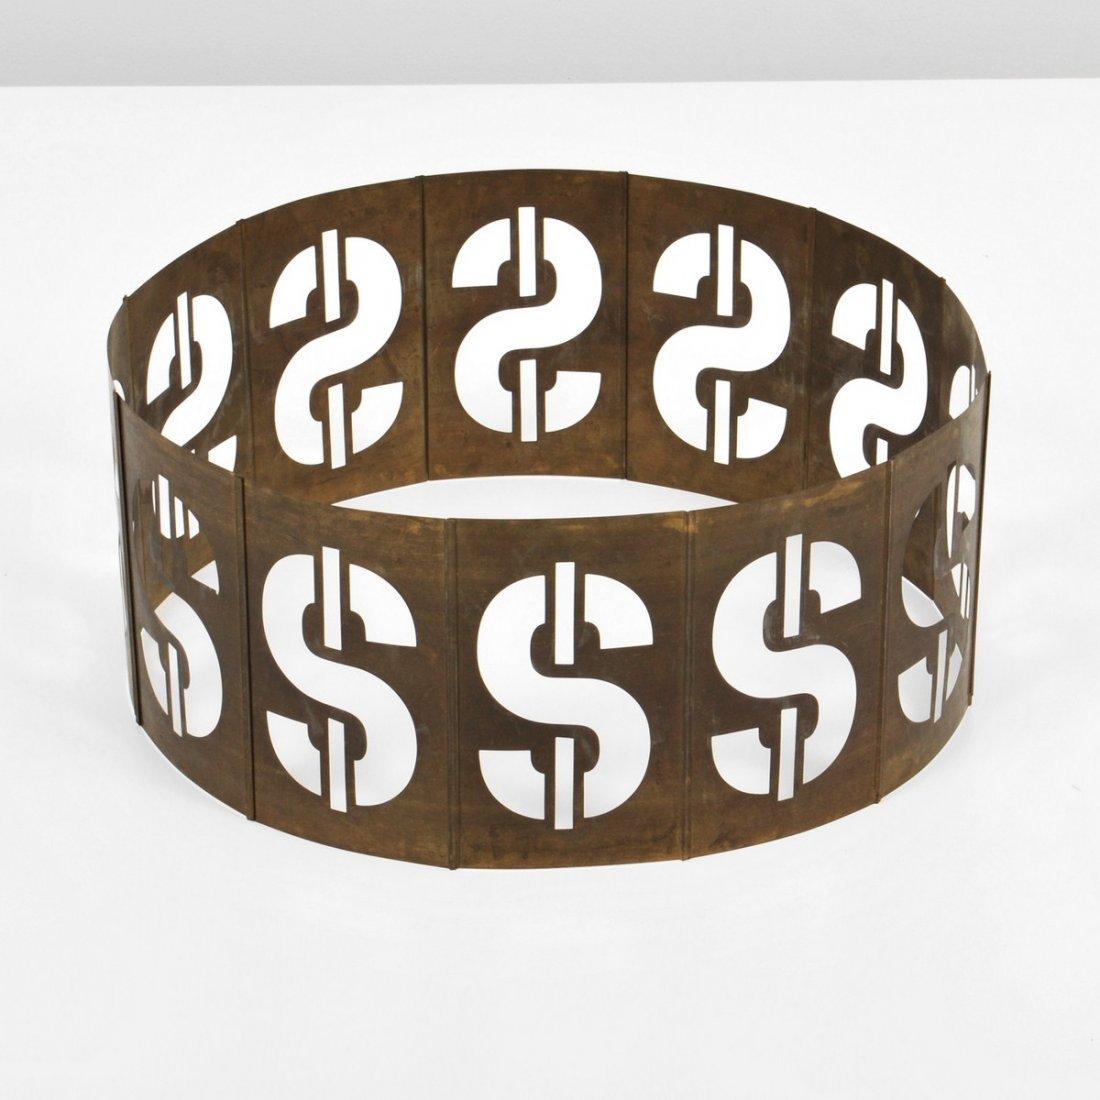 319: Signed Andy Warhol Dollar Sign Metal Sculpture